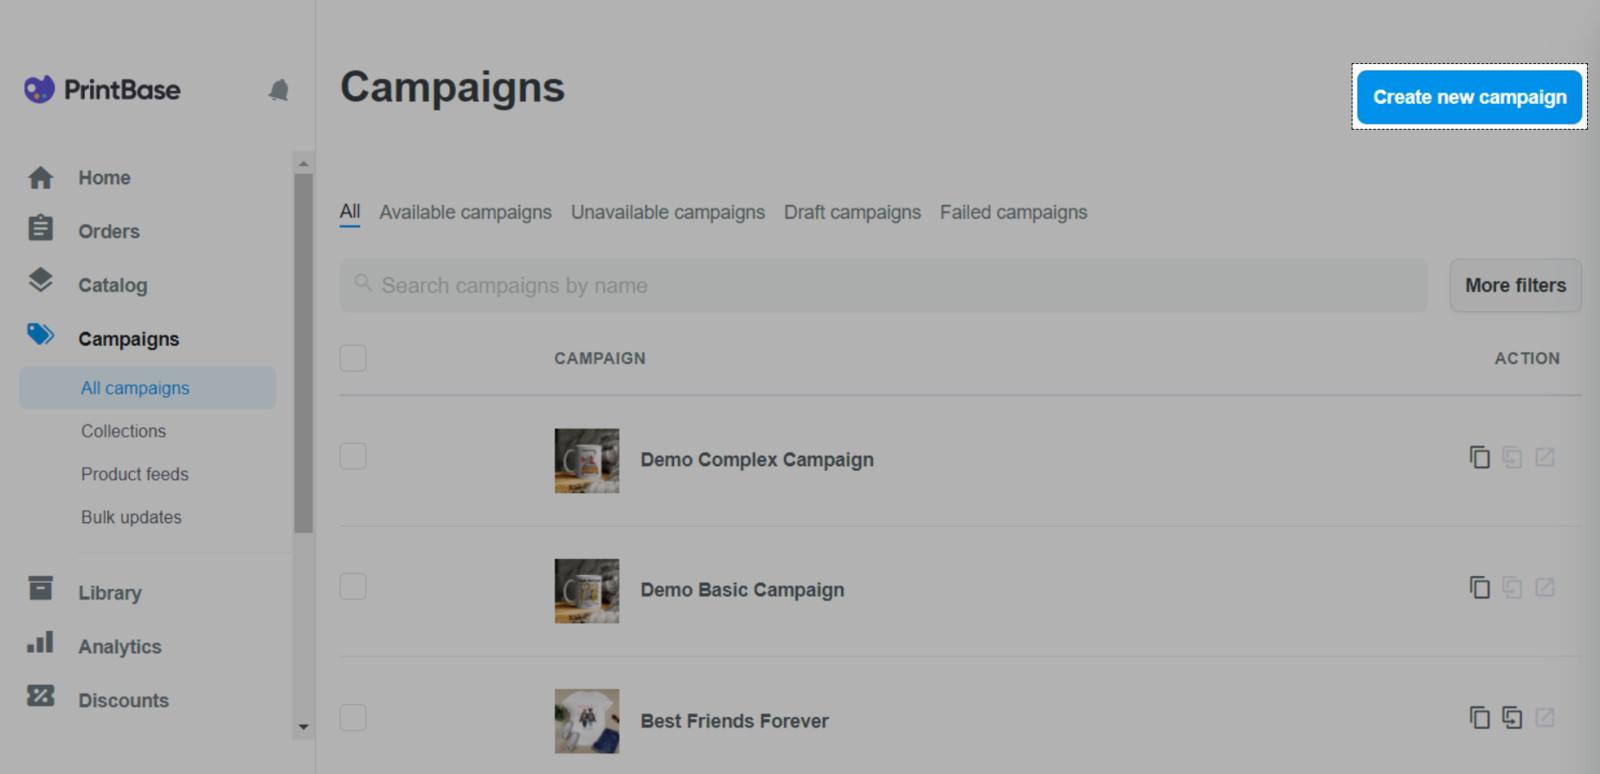 使用PrintBase在Campaigns部分中创建POD产品